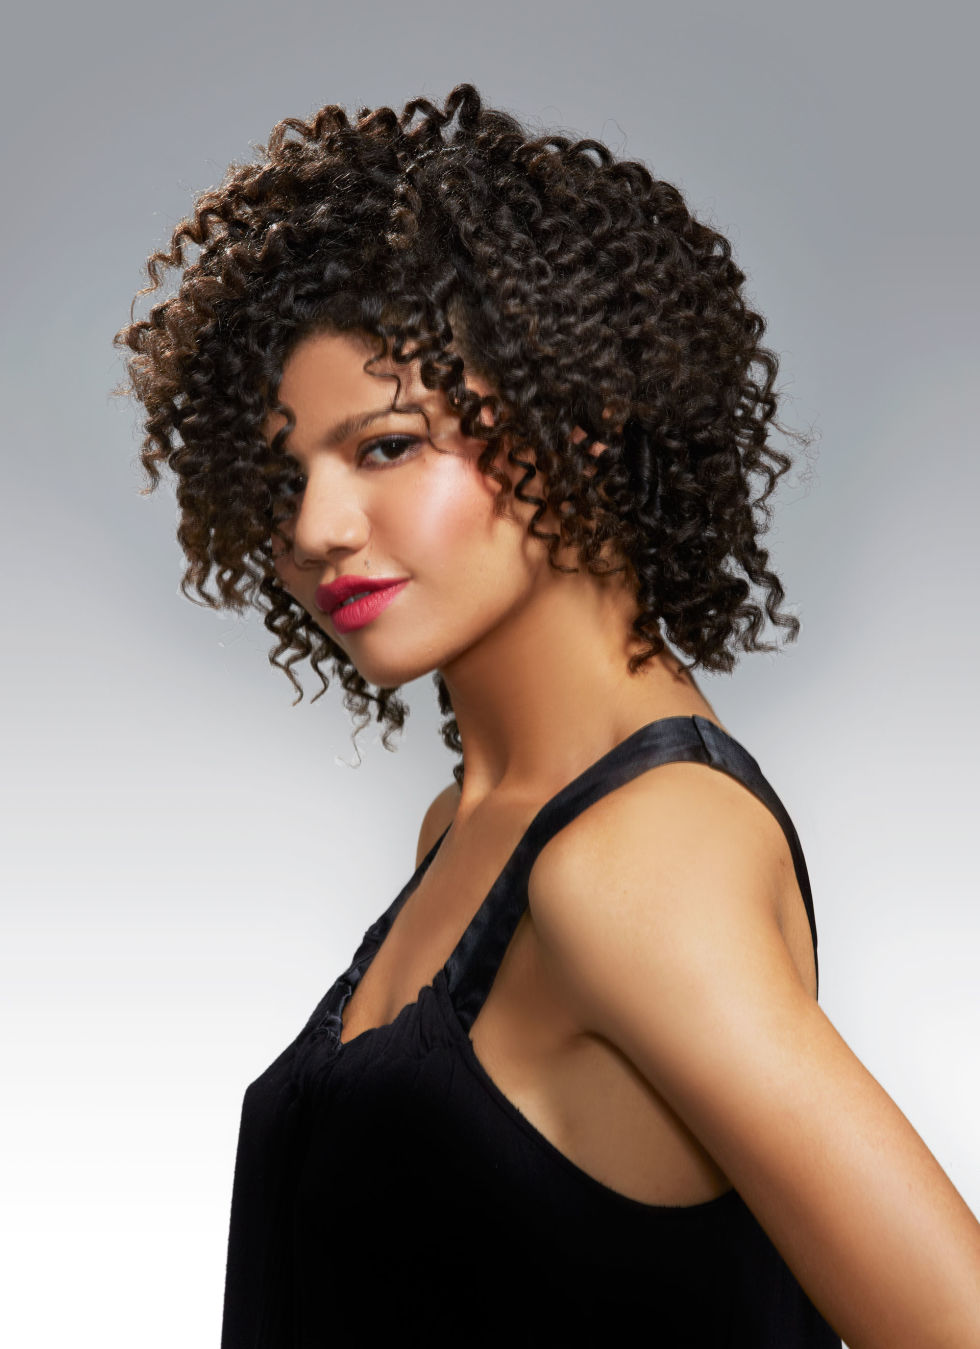 Outstanding 29 Black Hairstyles Best African American Hairstyles Amp Haircuts Short Hairstyles For Black Women Fulllsitofus